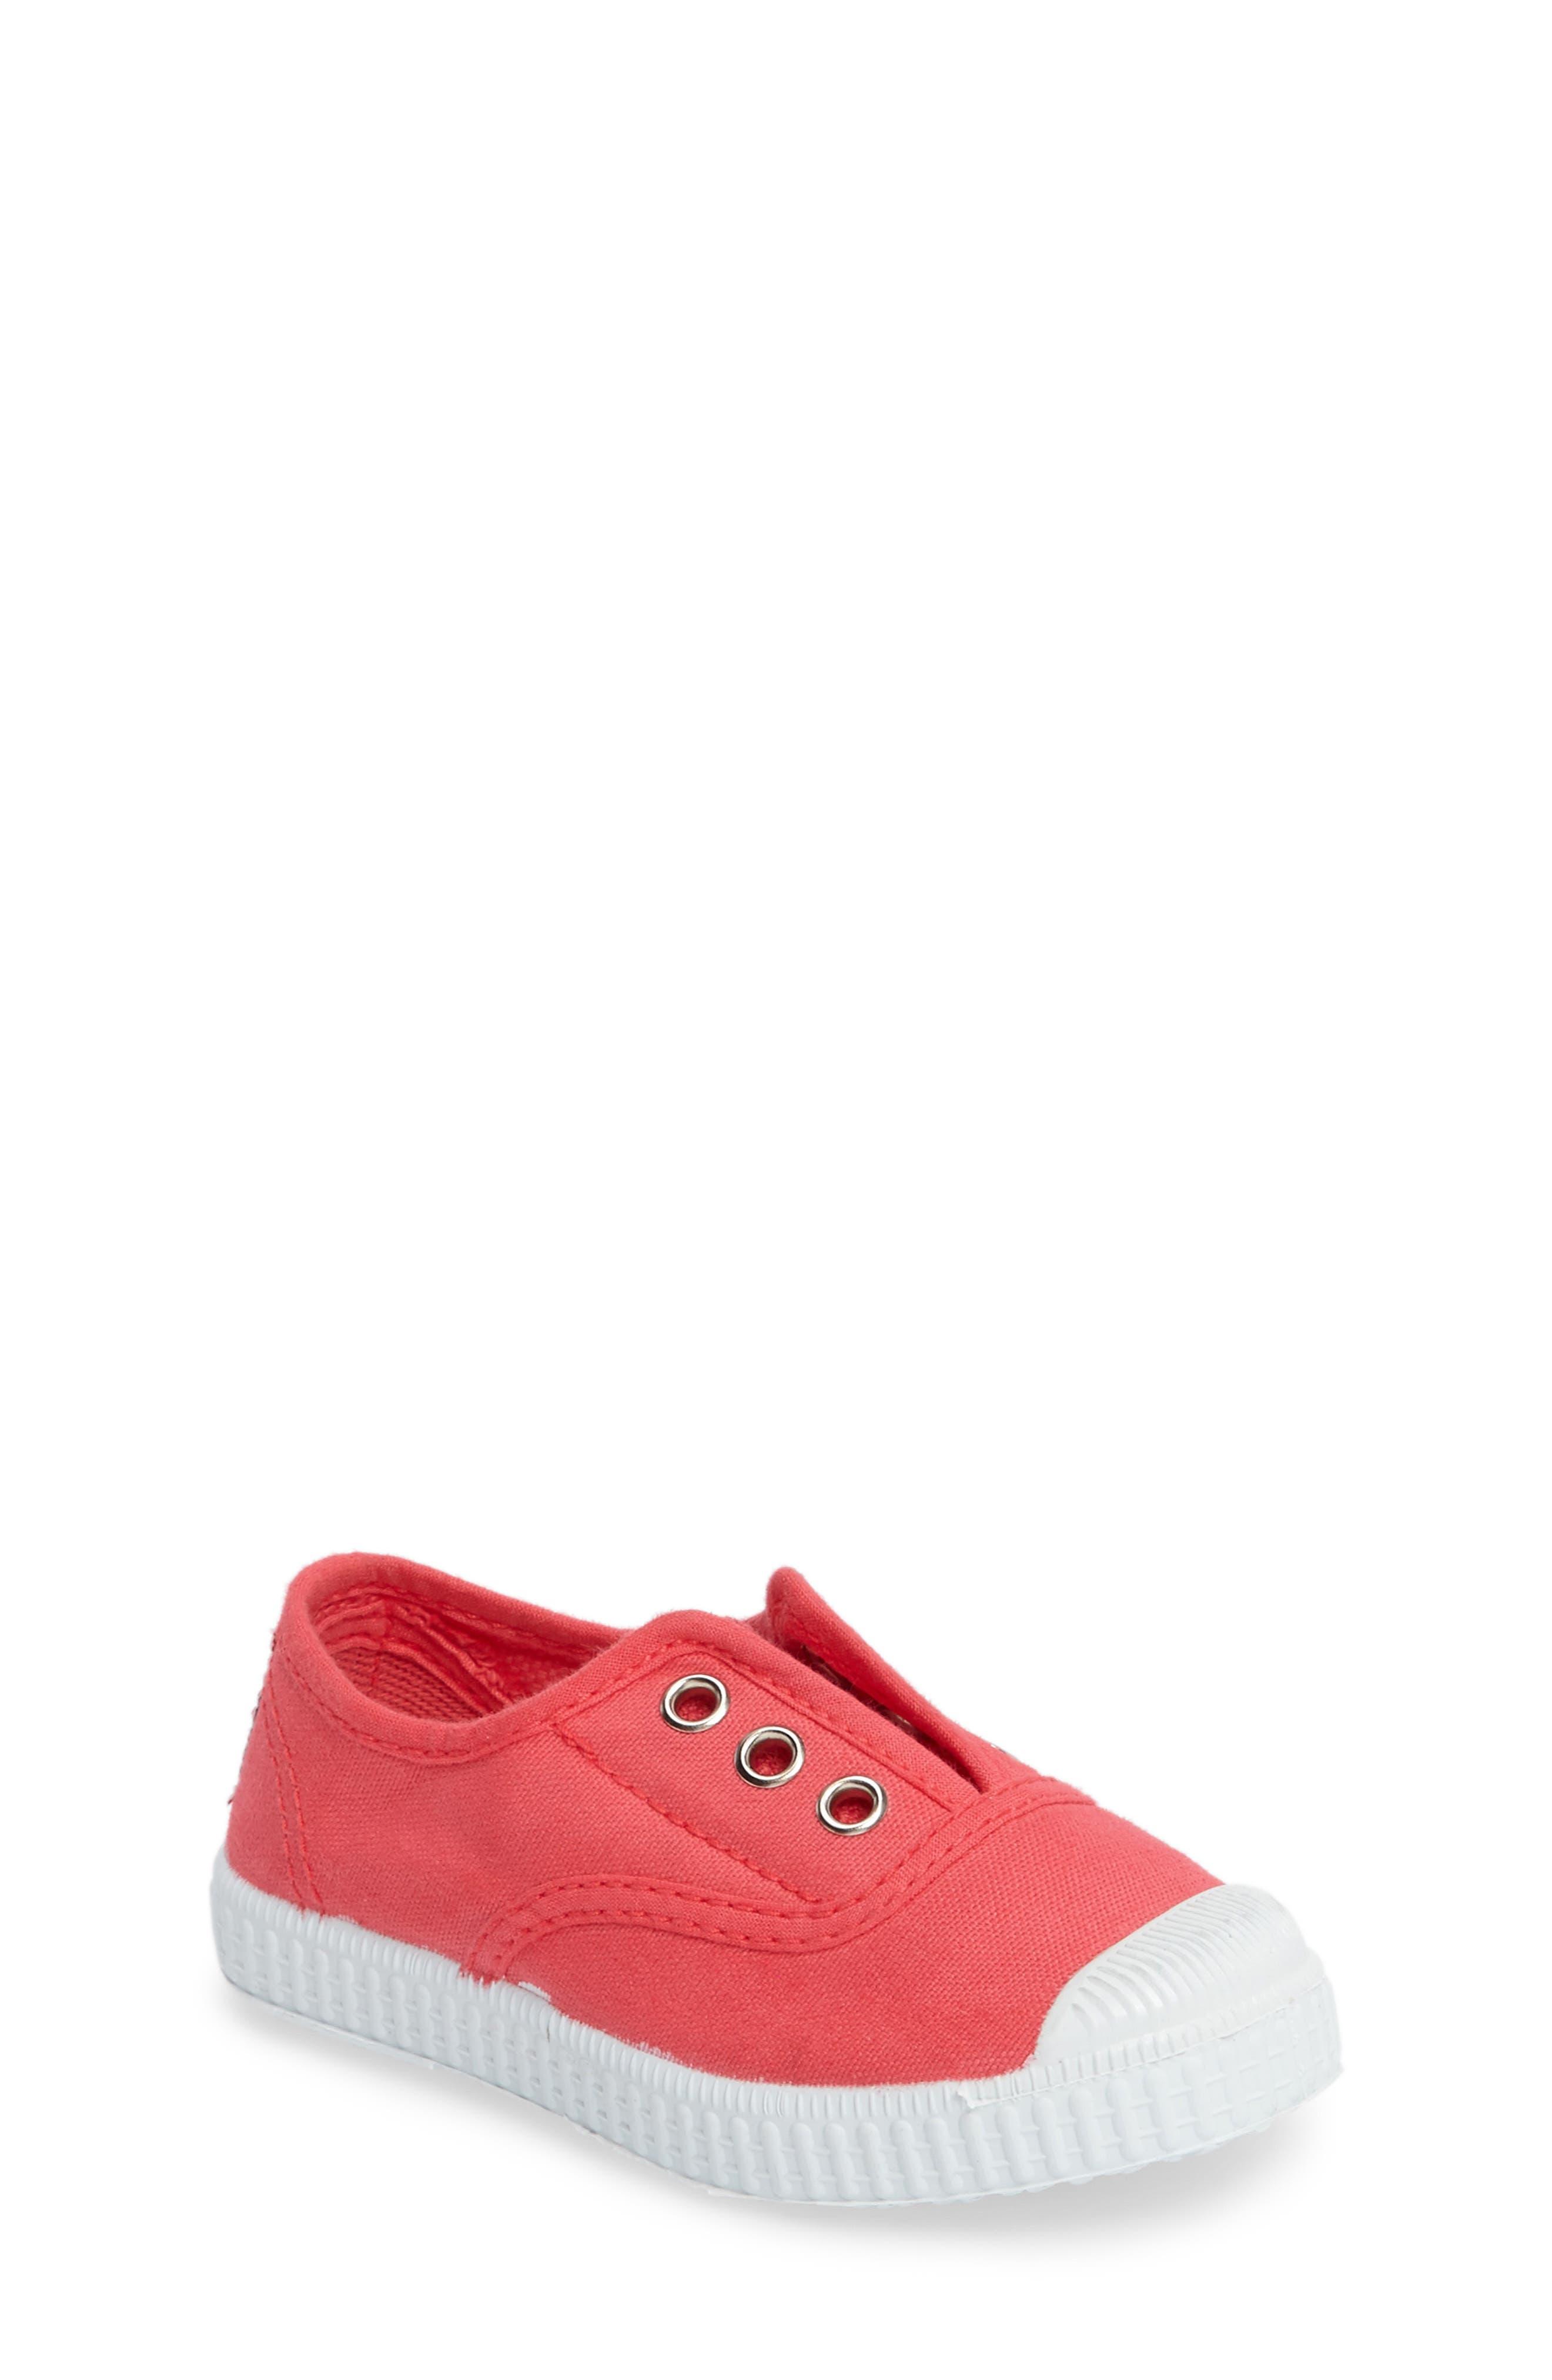 Alternate Image 1 Selected - Cienta Laceless Slip-On Sneaker (Walker & Toddler)